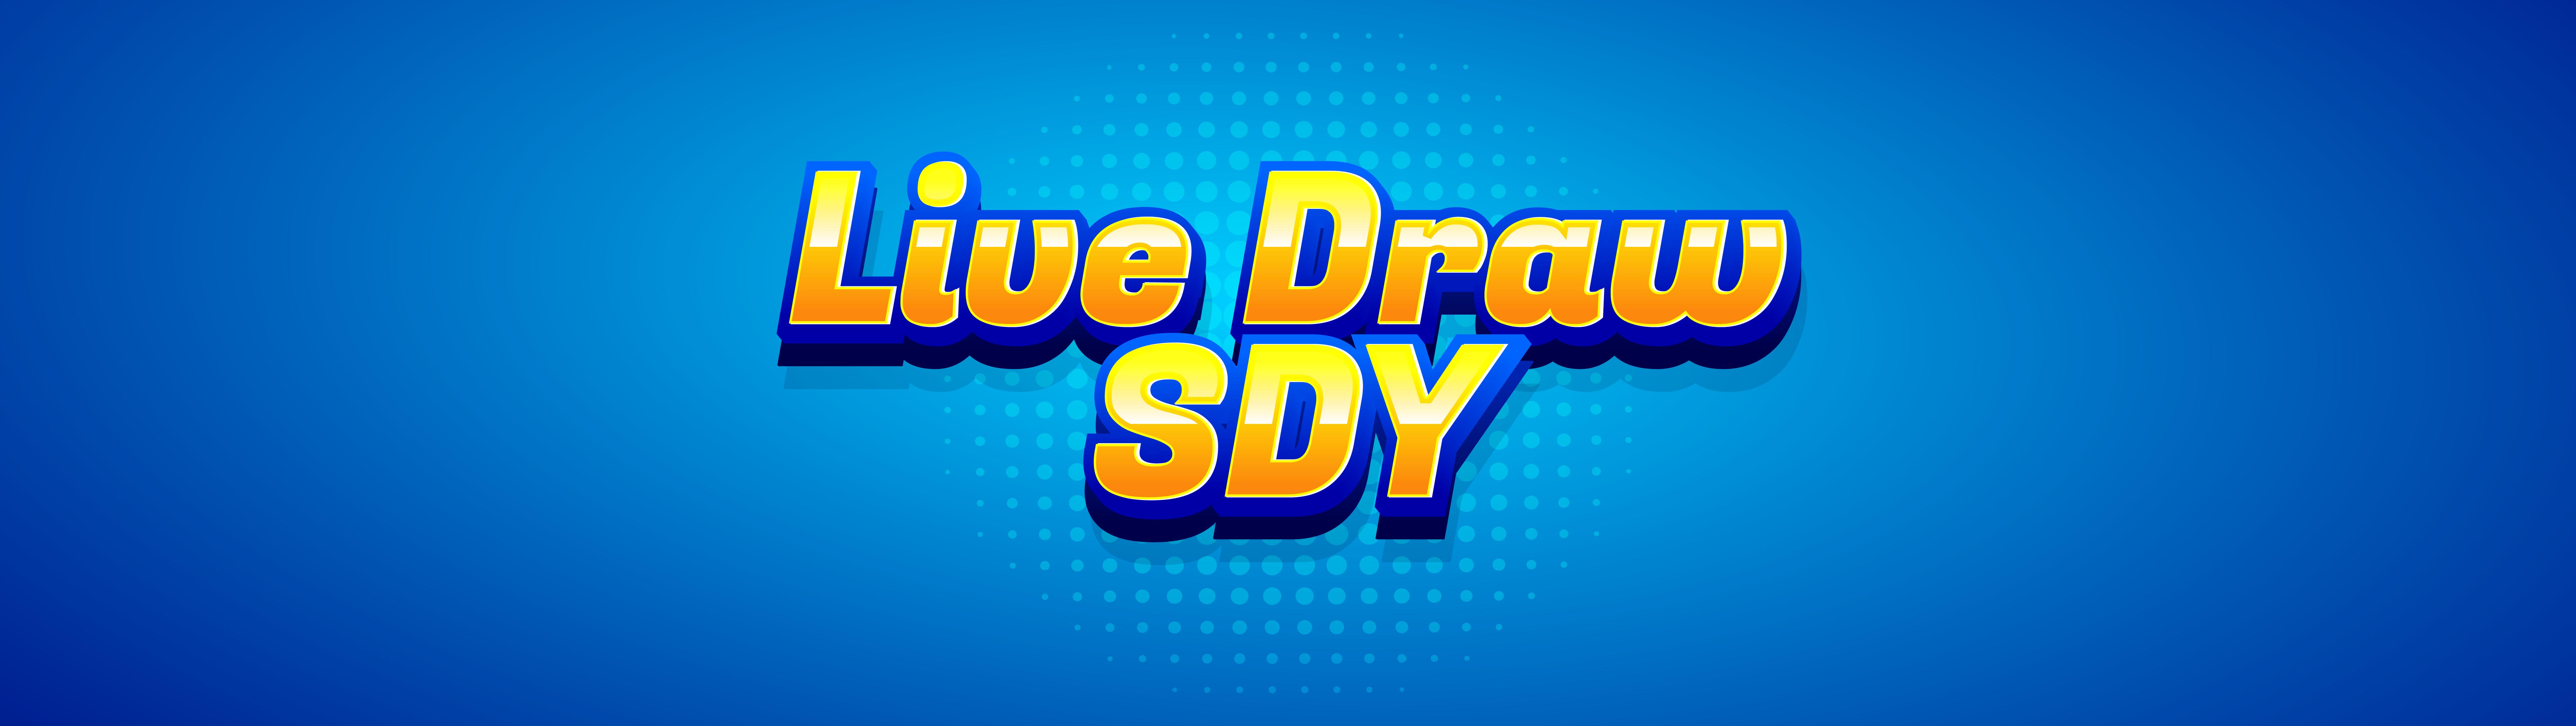 Live Draw Sydney